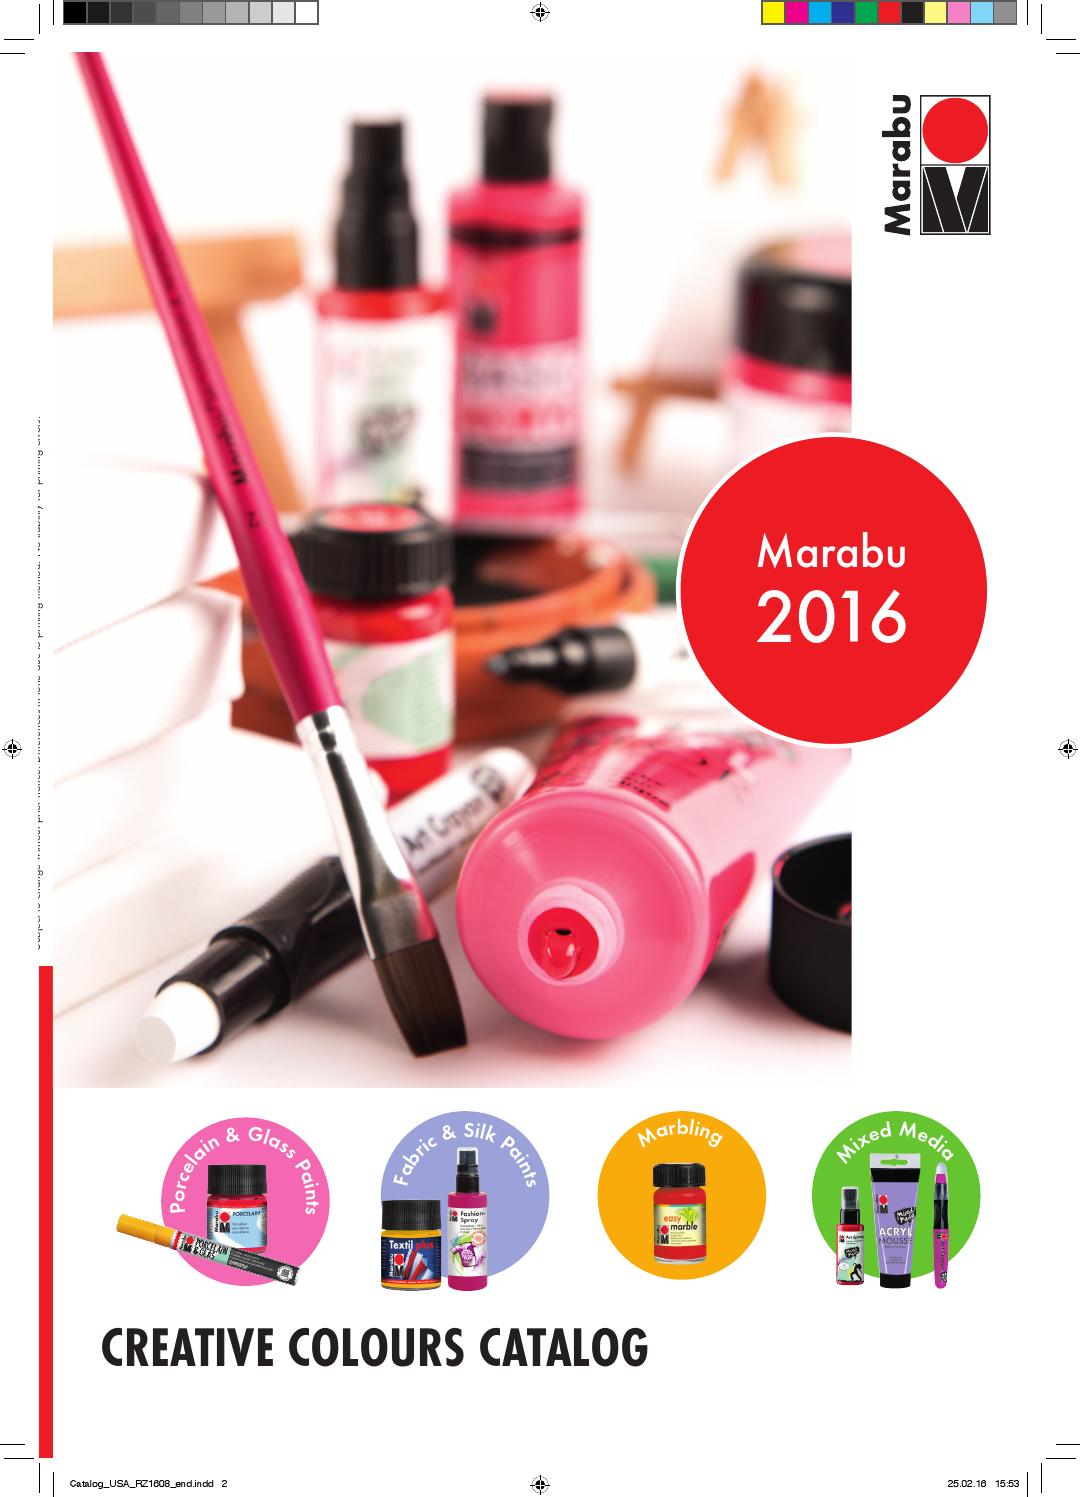 marabu mna catalog 2016 by marabu gmbh co kg issuu. Black Bedroom Furniture Sets. Home Design Ideas